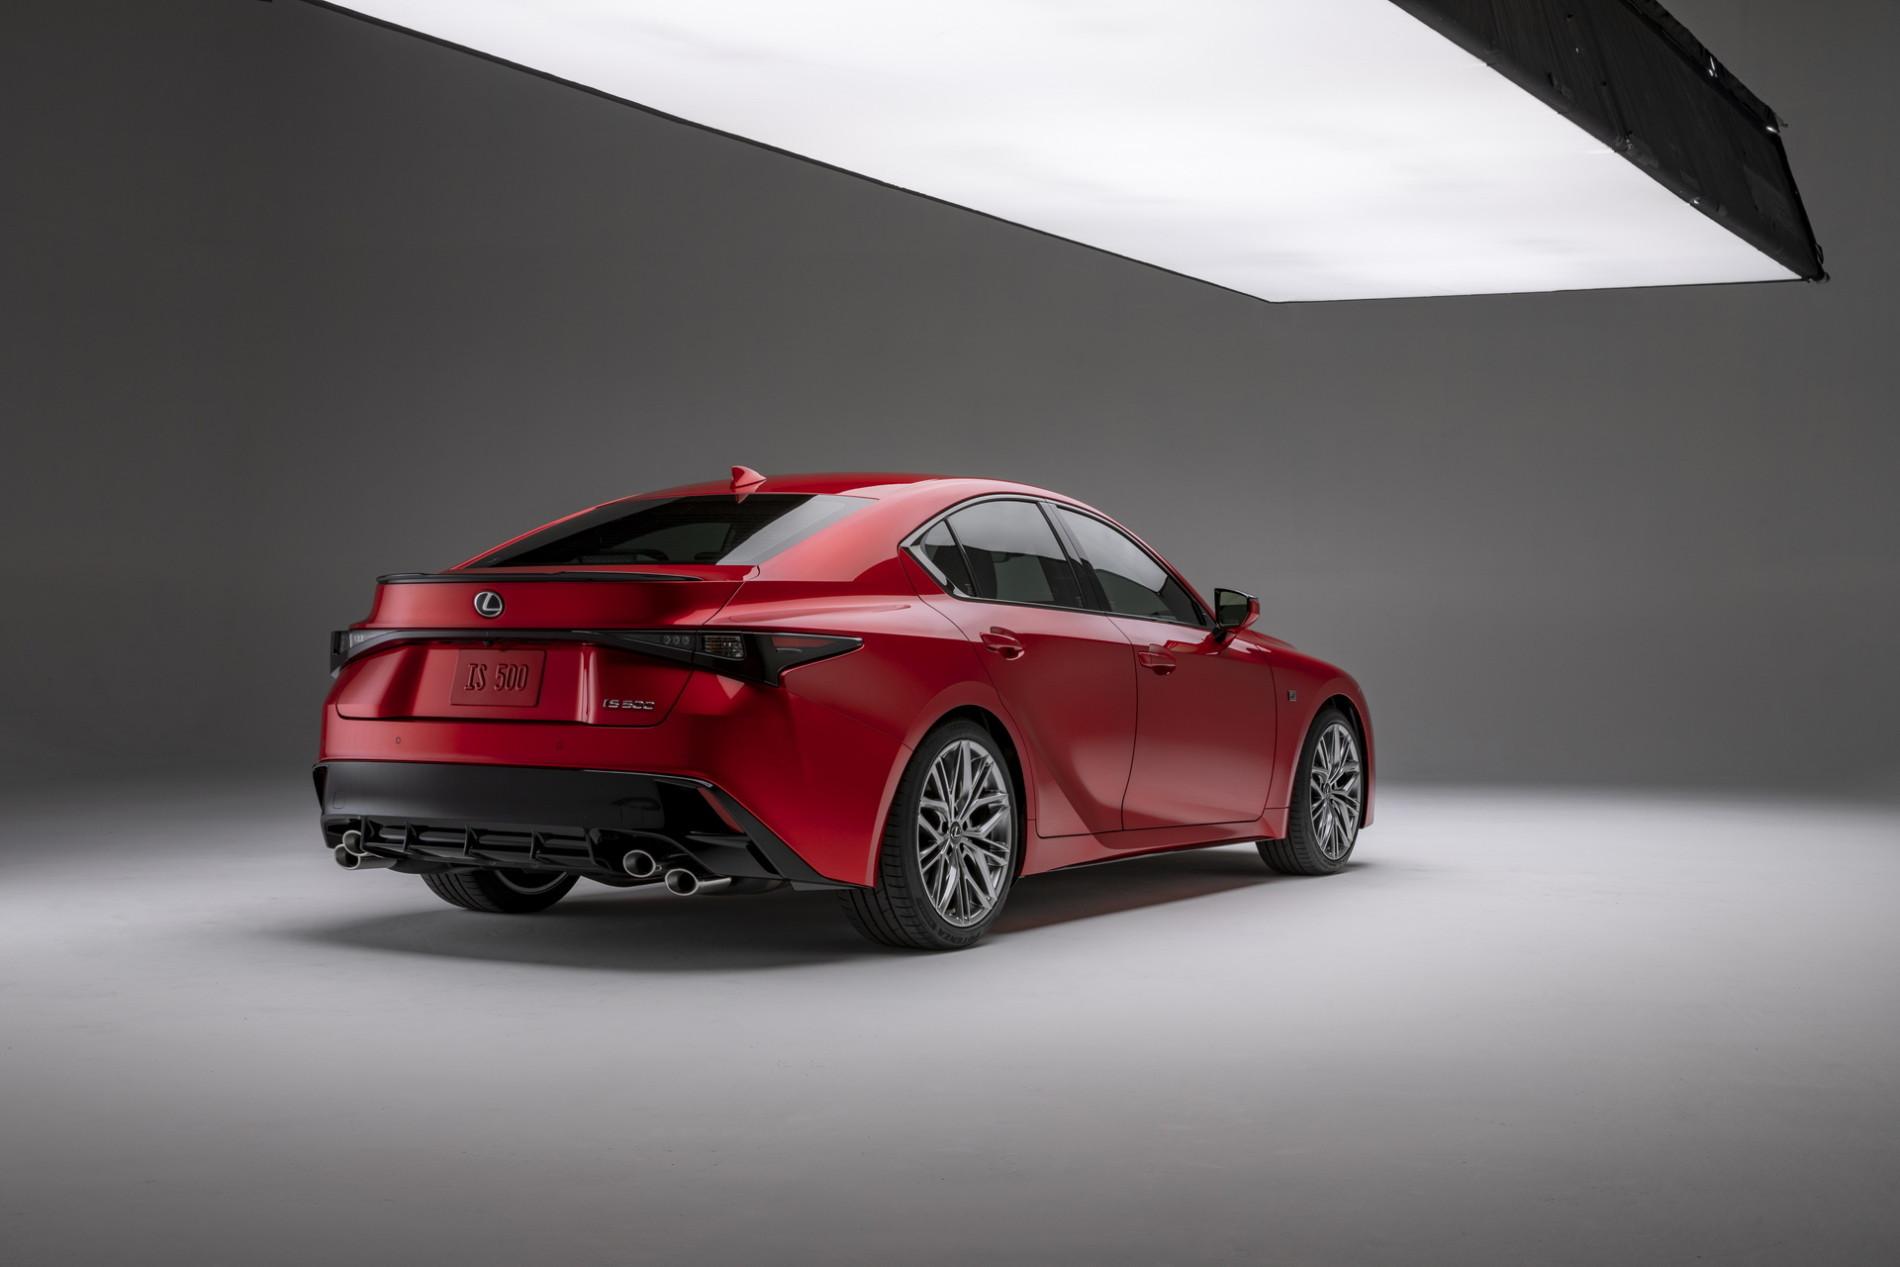 Lexus IS 500 F Sport Performance - Lexus IS 500 F Sport Performance